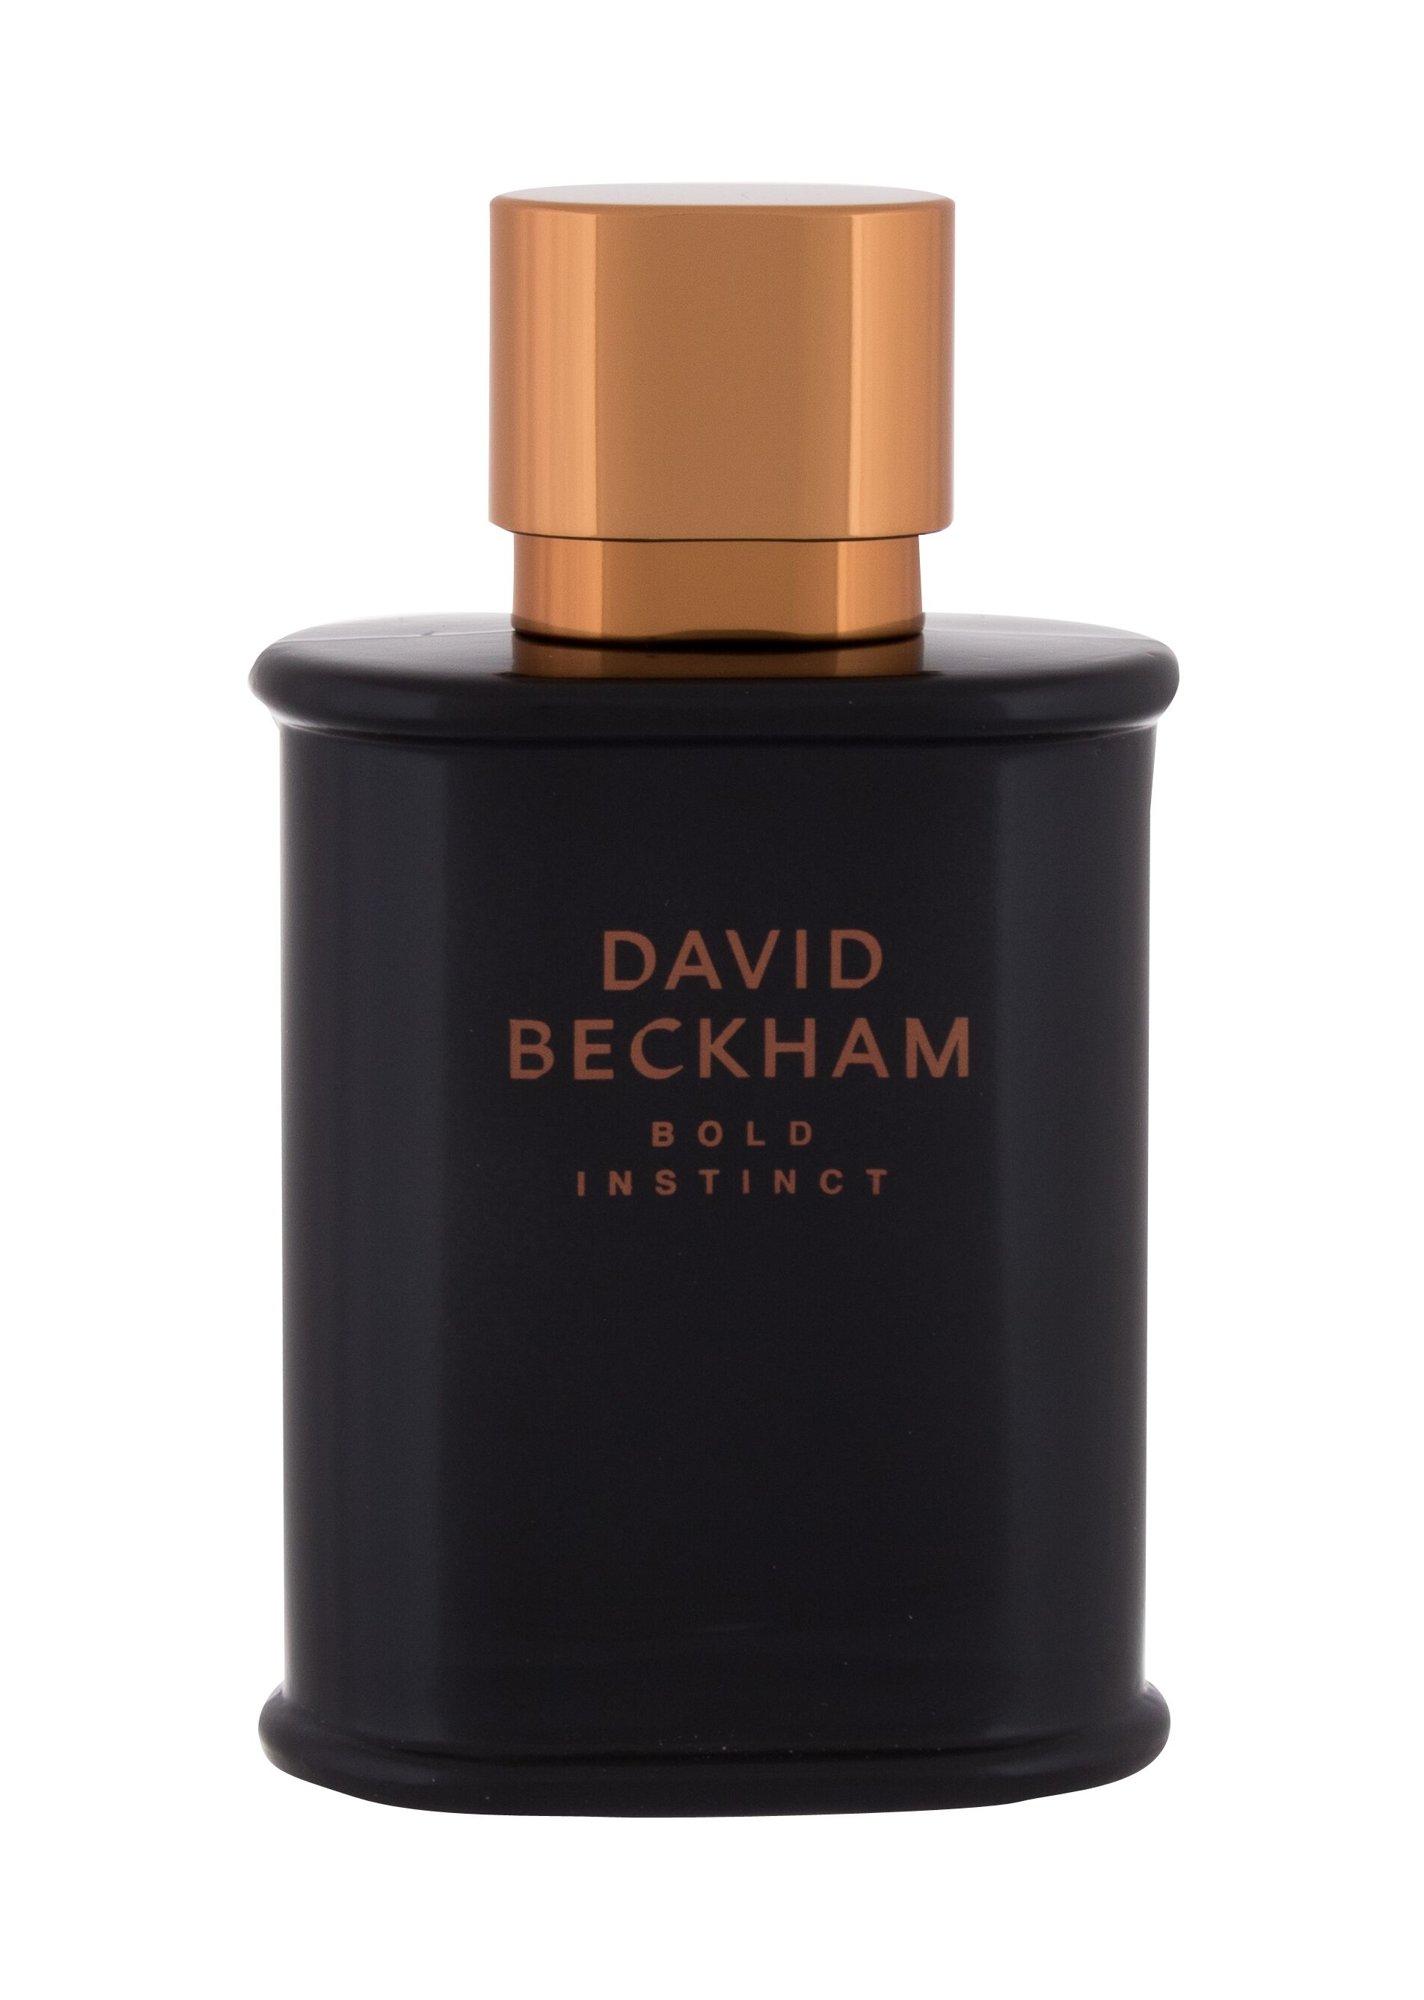 David Beckham Bold Instinct, edt 75ml